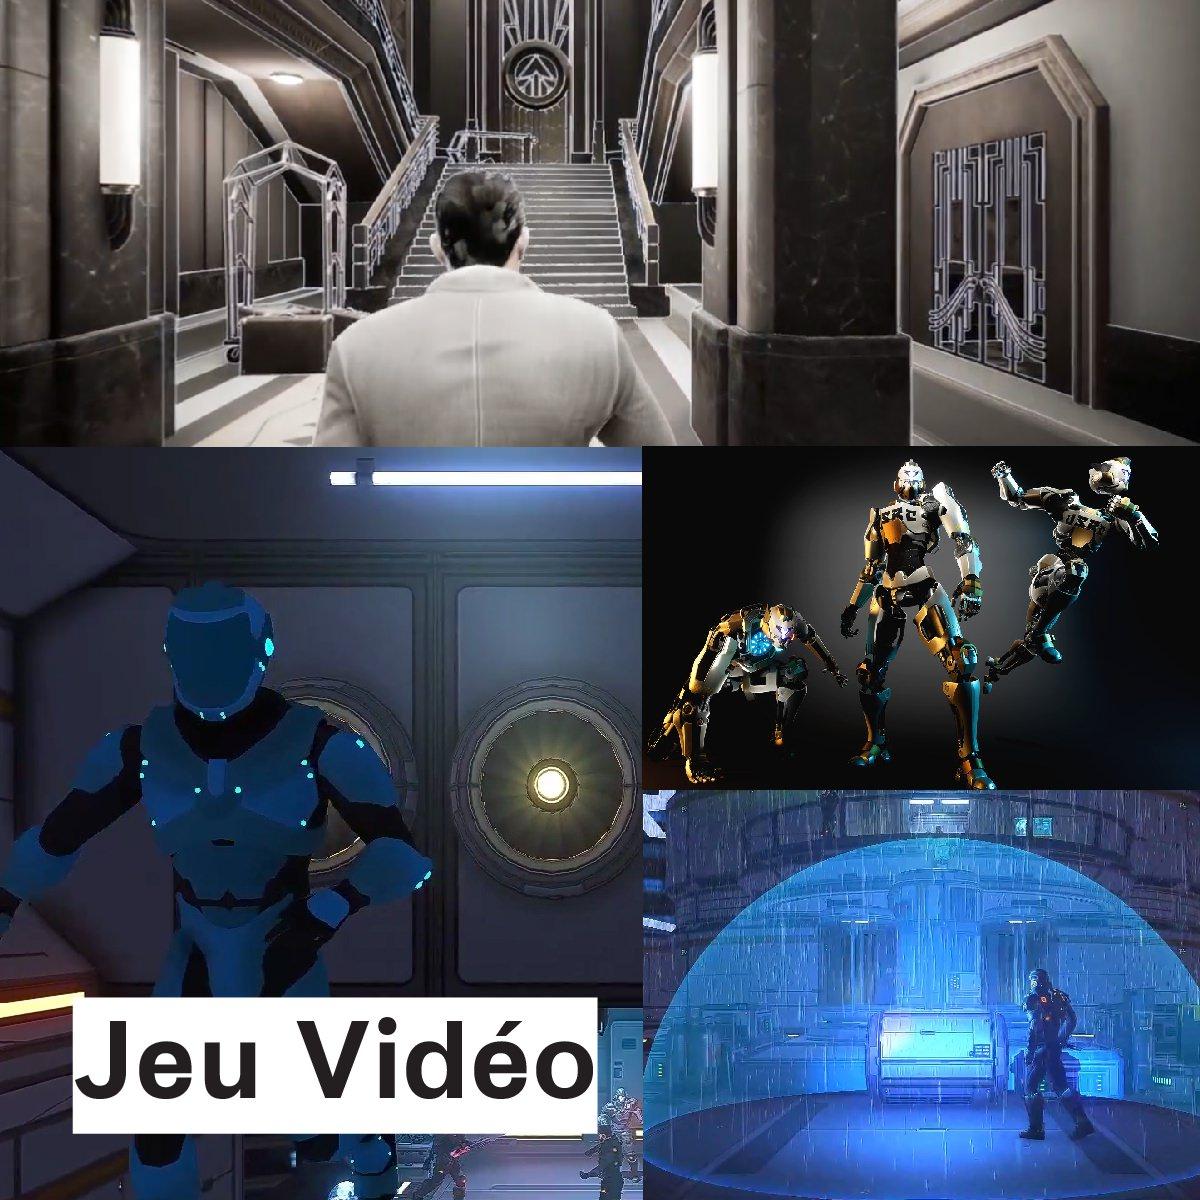 Bellecour Ecole - Jeu Video